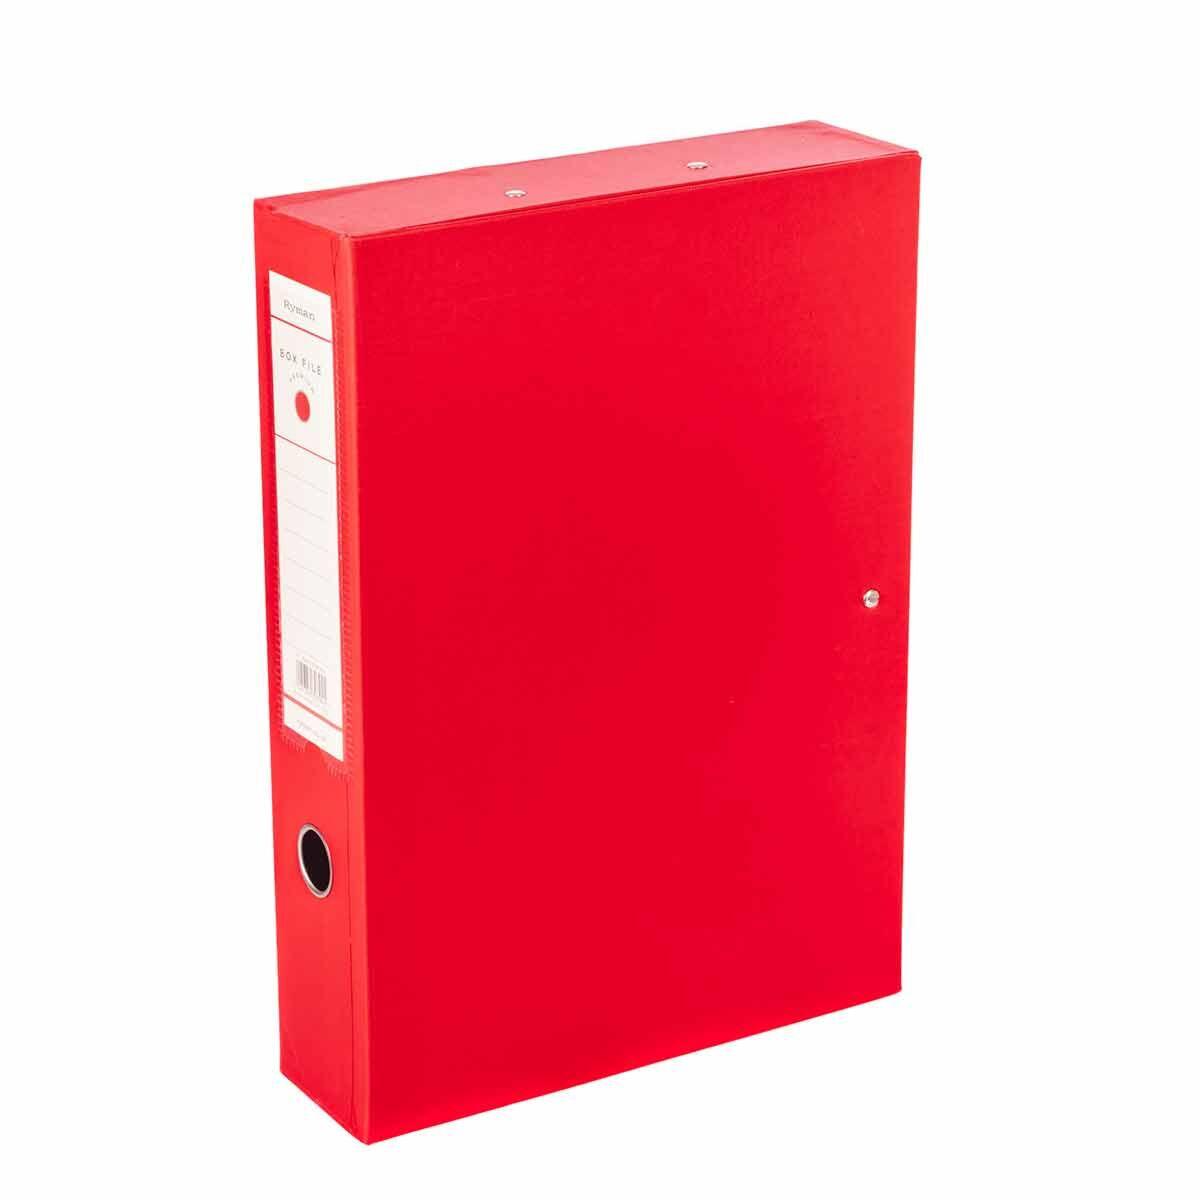 Ryman Premium Box File Foolscap Pack of 10 Red